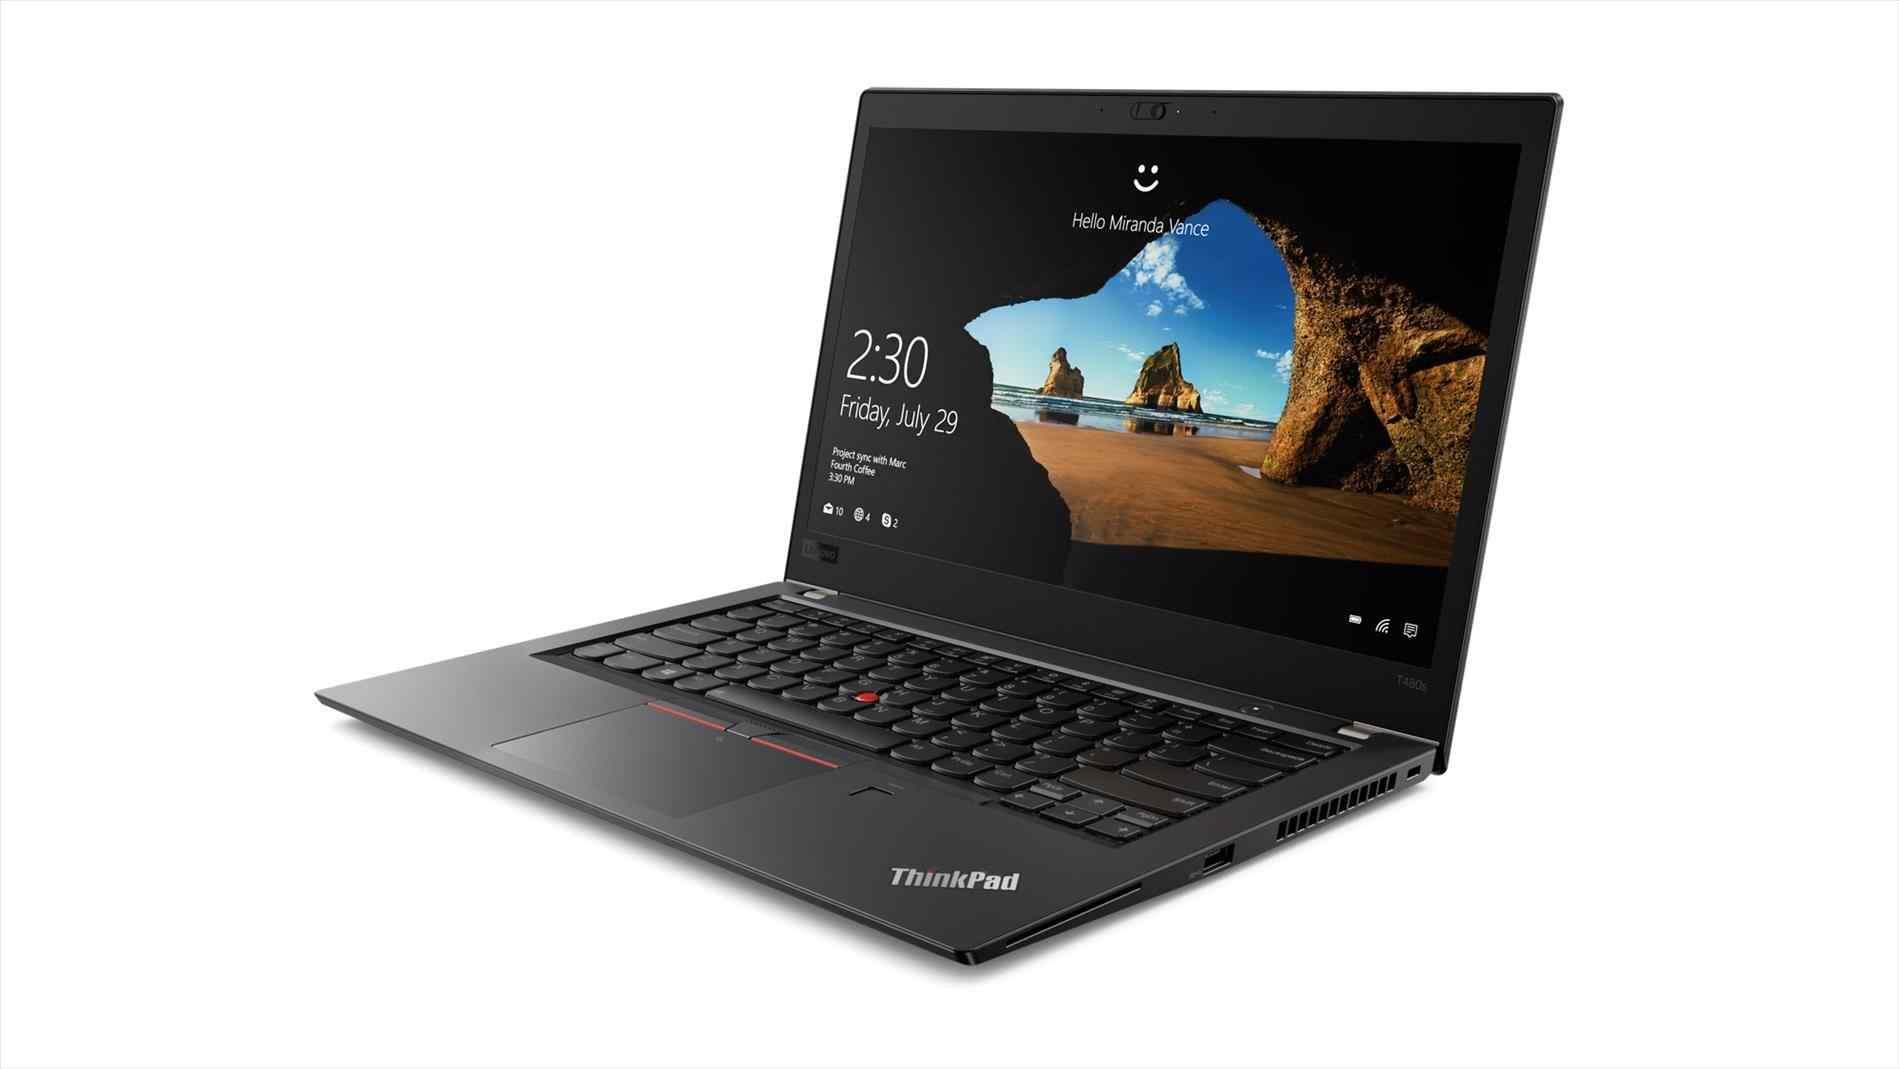 Lenovo ThinkPad X280 Series - Notebookcheck net External Reviews